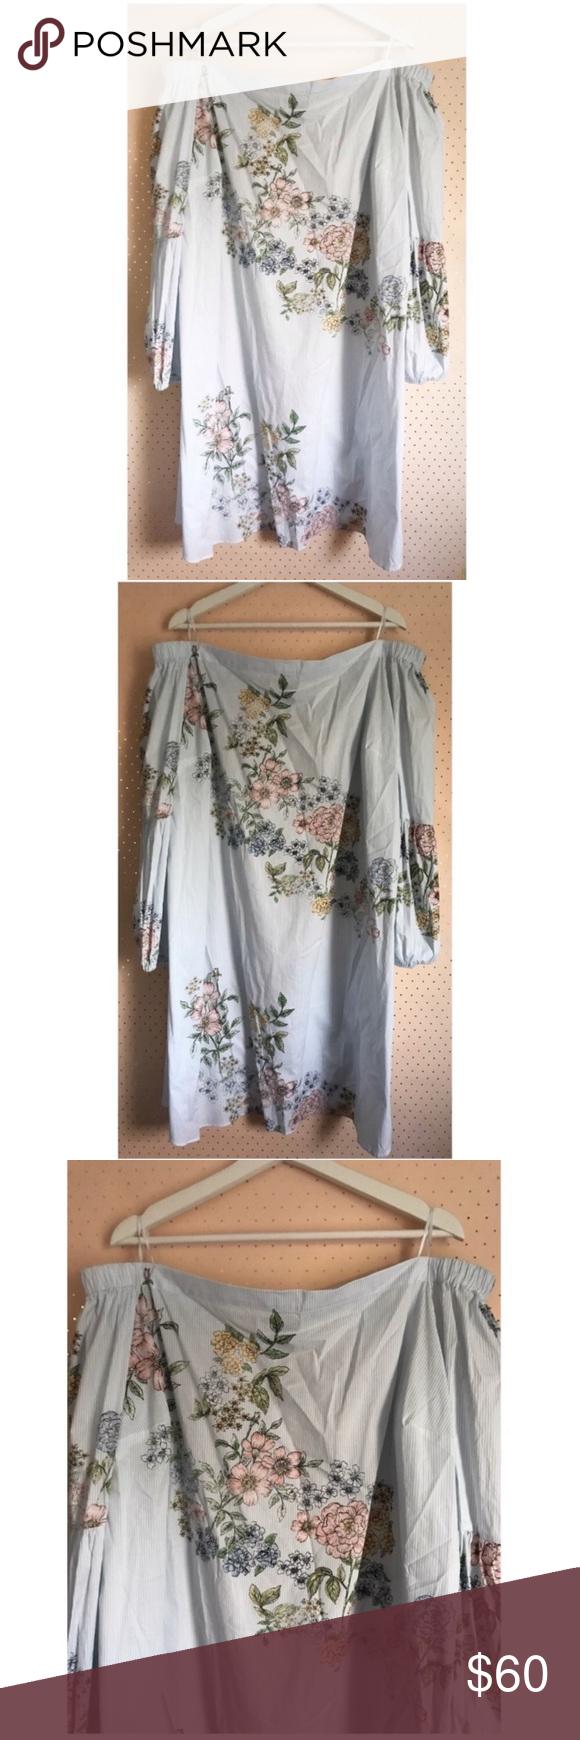 Kaari Blue Off The Shoulder Pink Floral Dress Nwt Kaari Blue Off The Shoulder Floral Dress With Lantern Sleeves Brand Pink Floral Dress Floral Dress Dresses [ 1740 x 580 Pixel ]